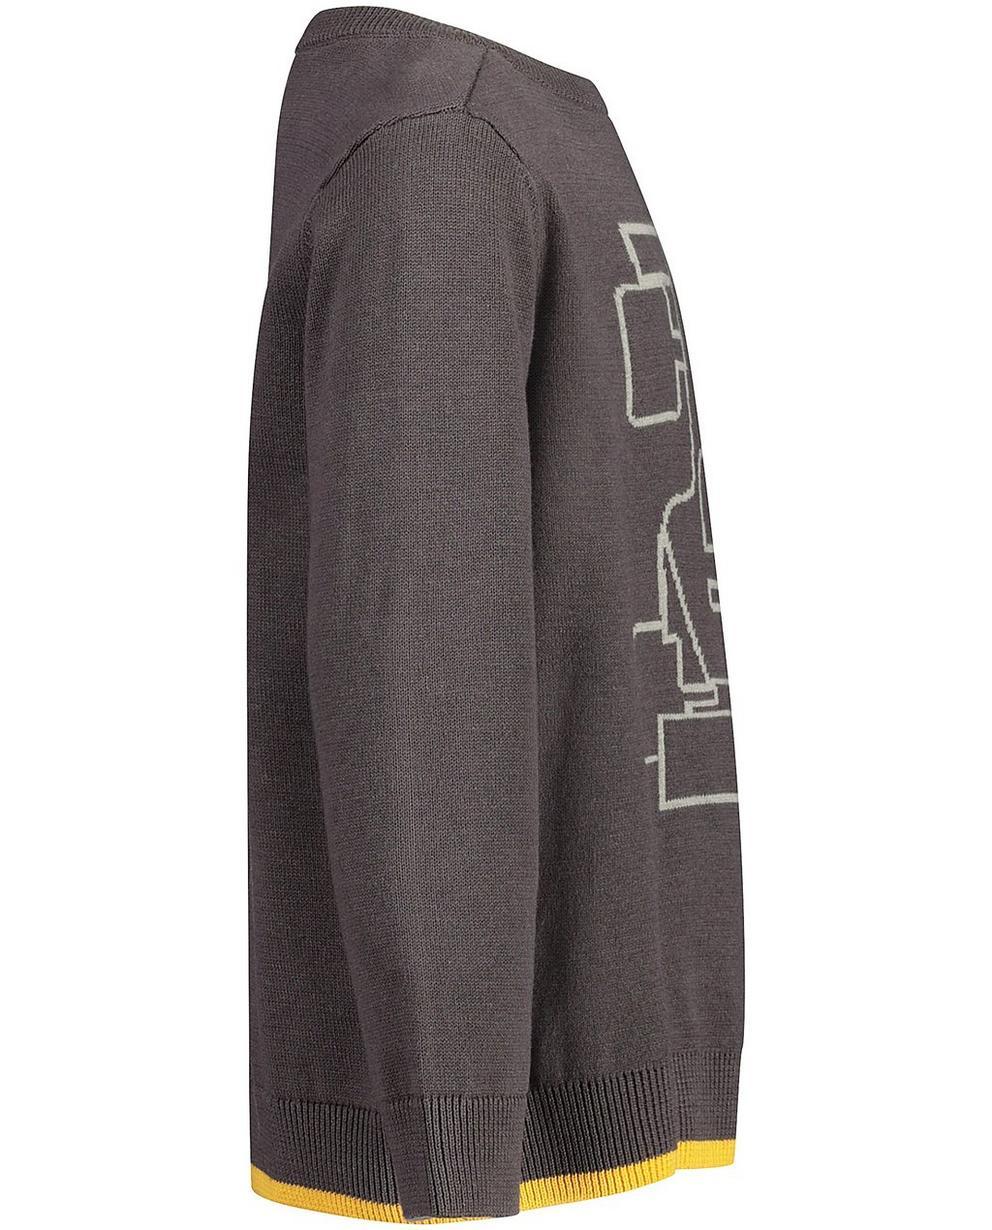 Pullover - Dunkelgrau - Sweatshirt mit Autoprint